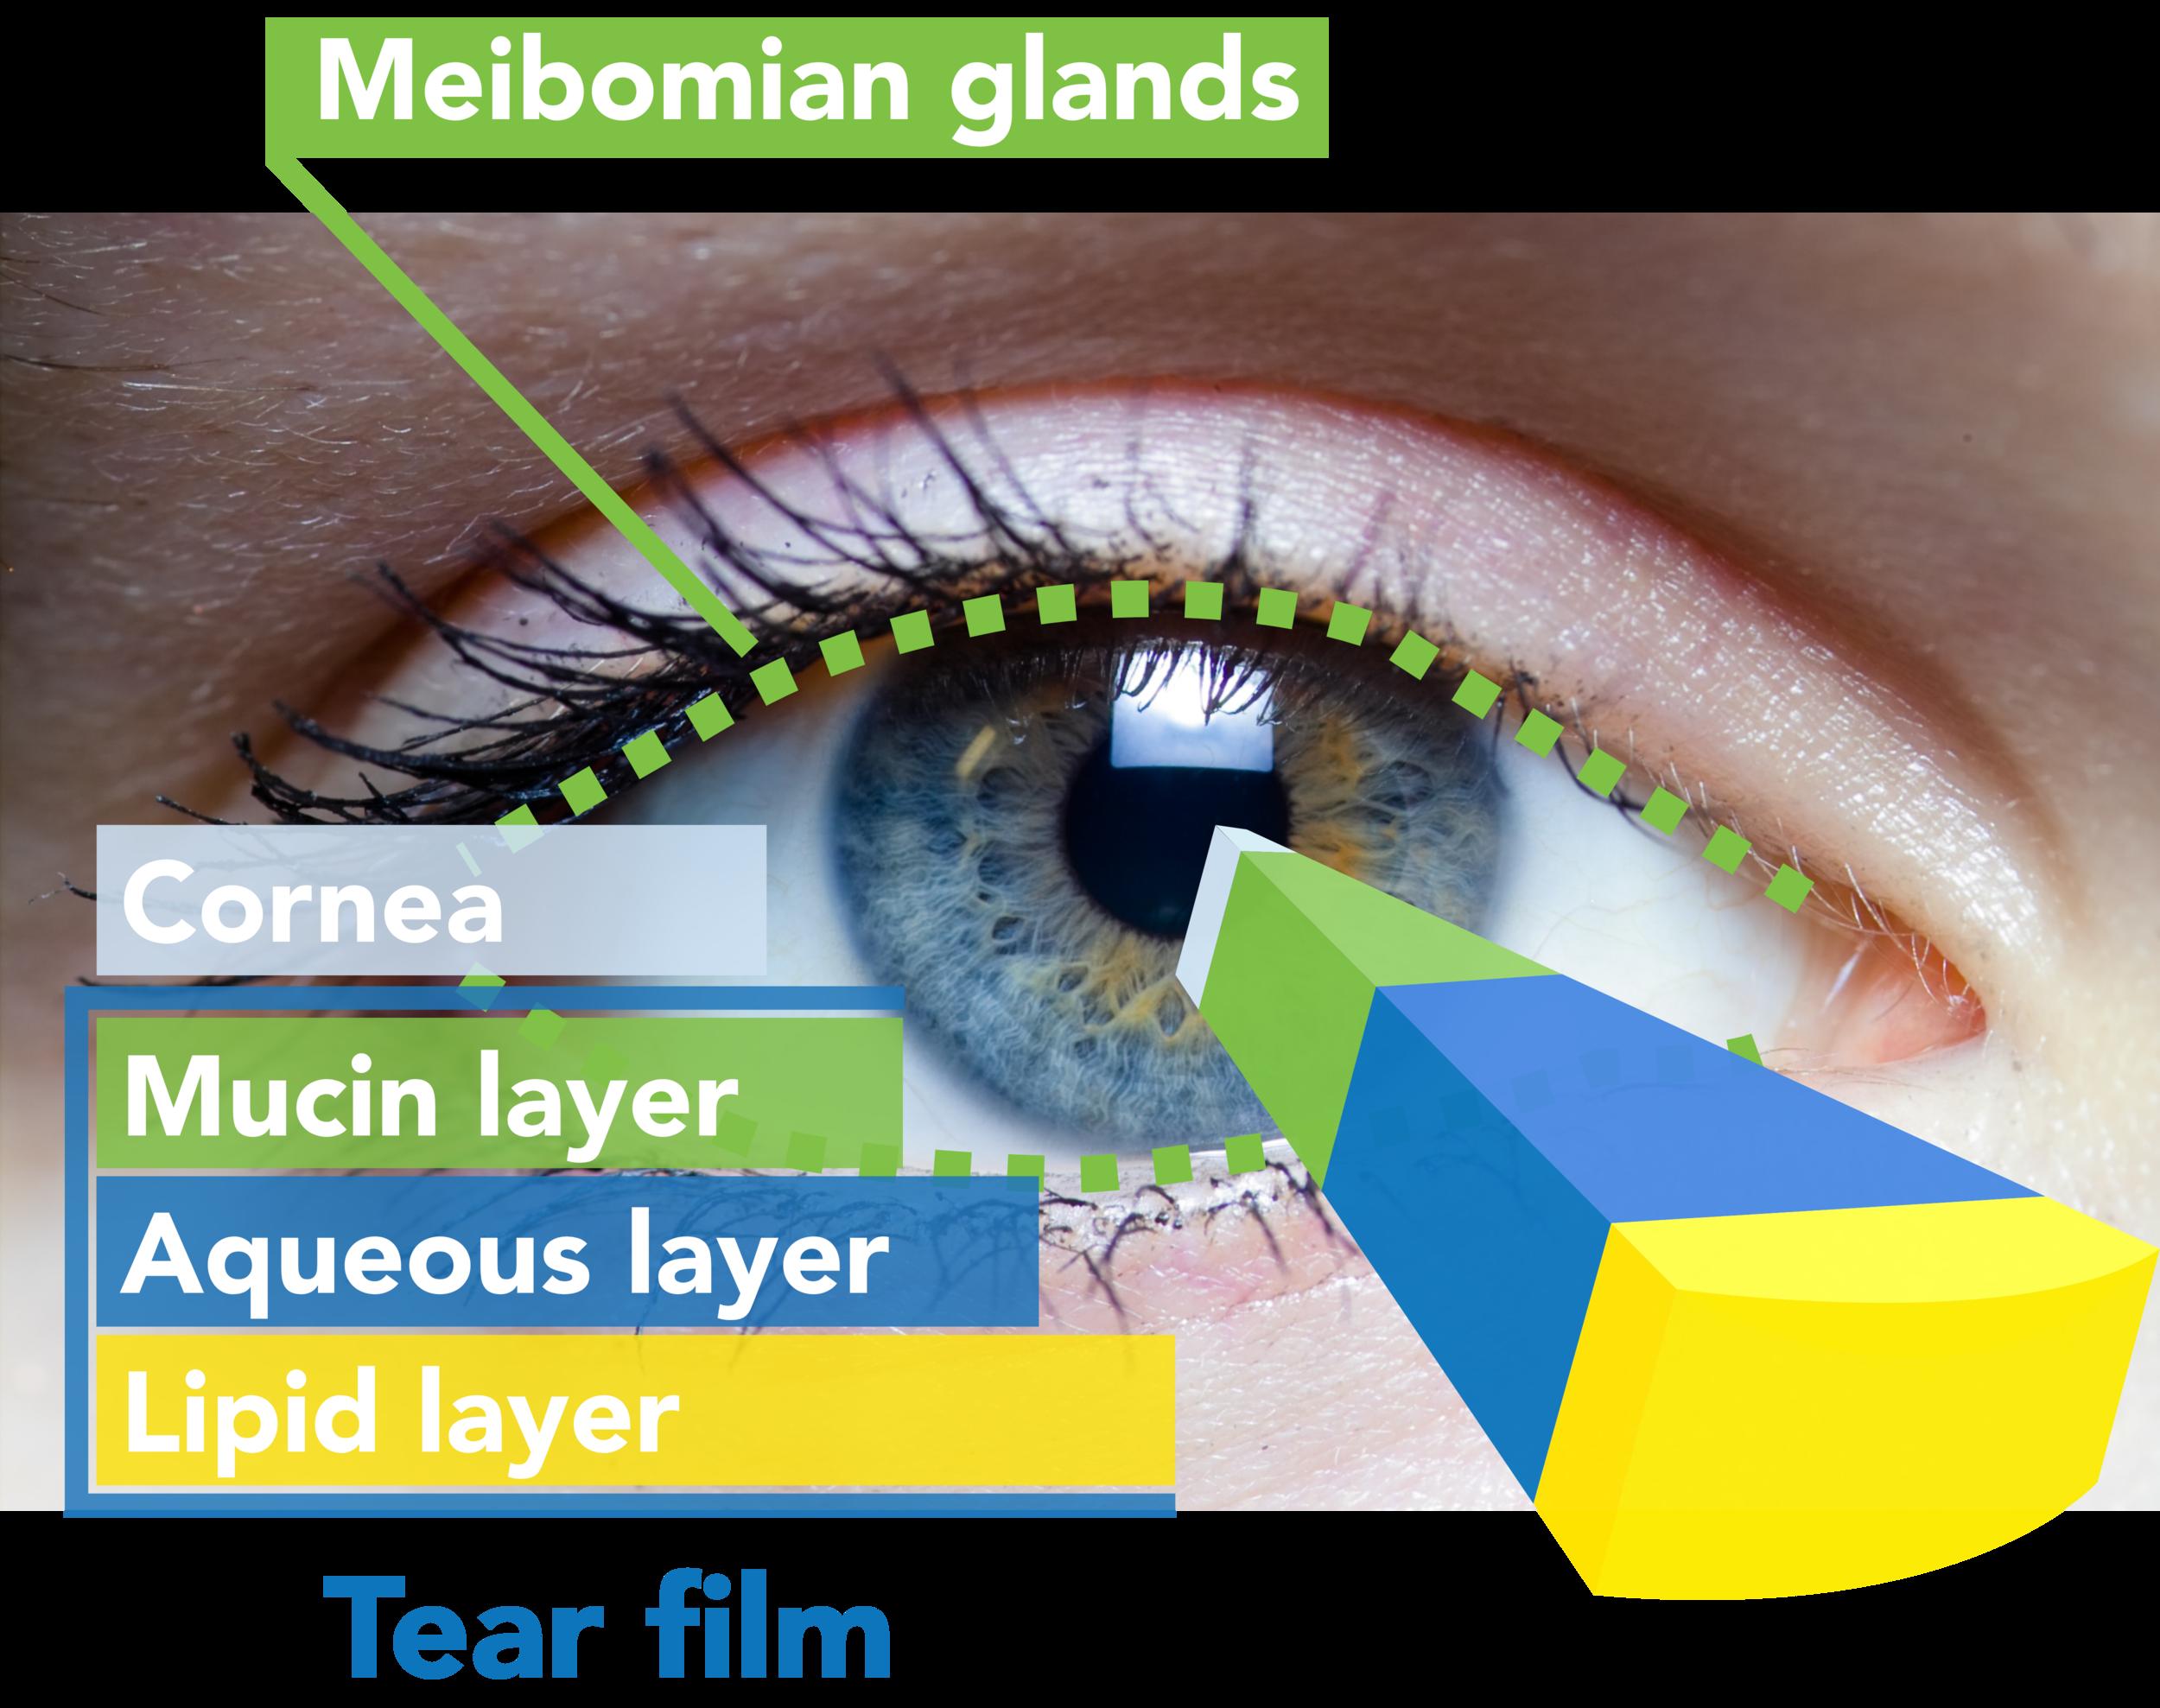 Eyelash clipart eye blink. Dry mineola eyecare